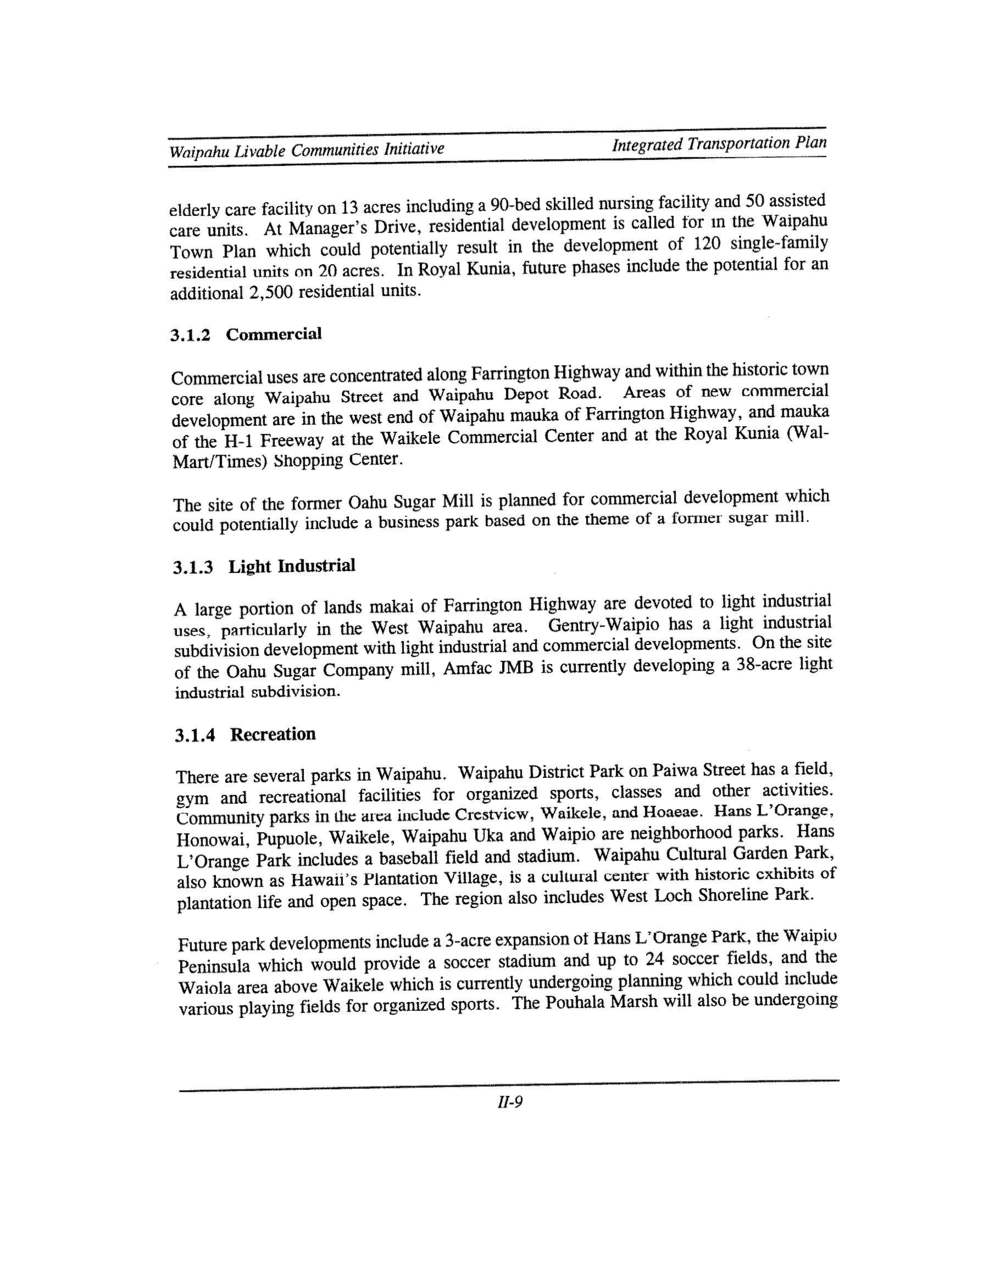 160531_WaipahuLivableCommunities(1998)_Page_024.jpg